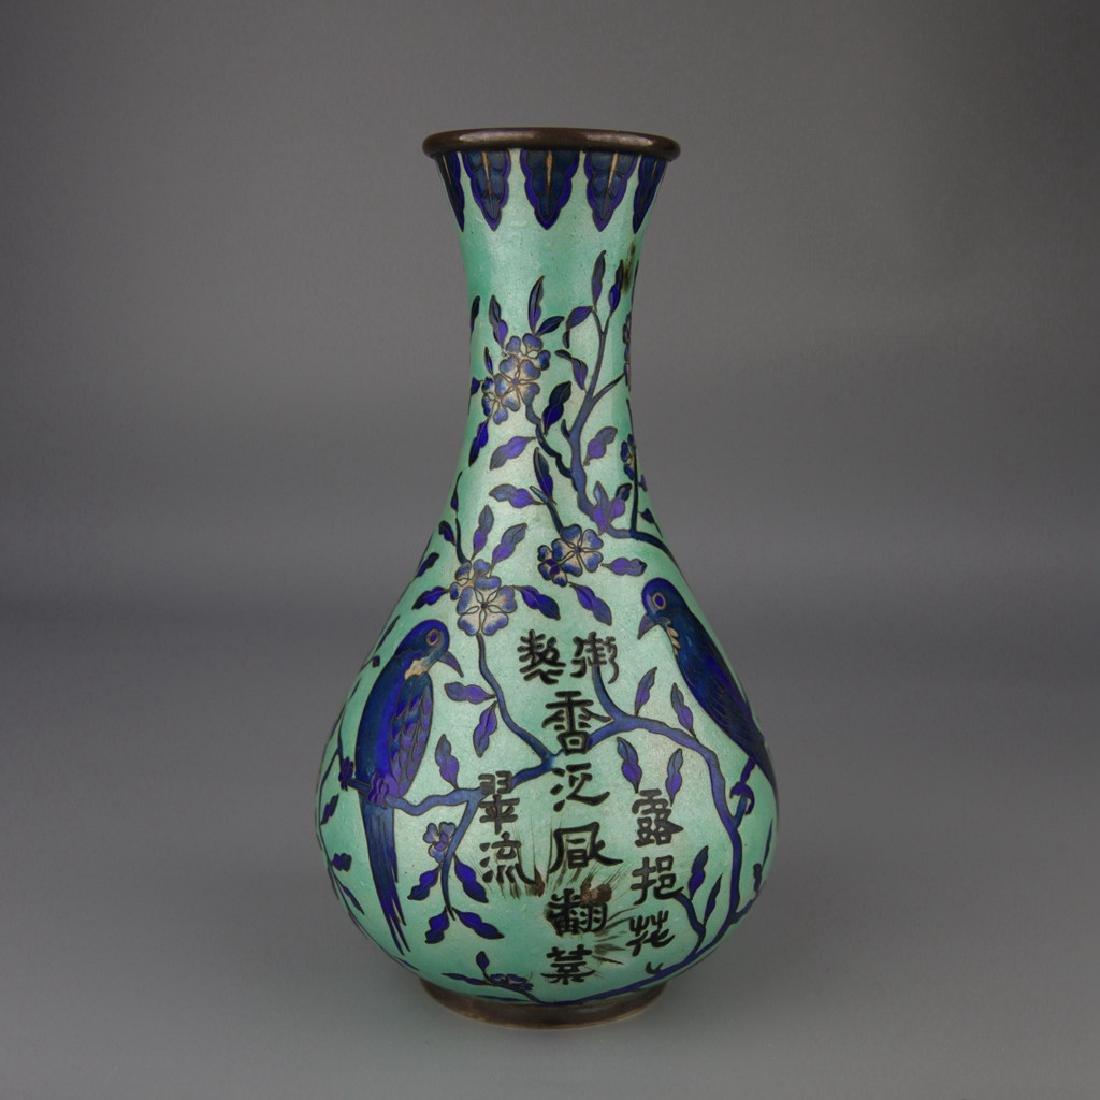 A cloisonne enamel Yuhuchun Vase